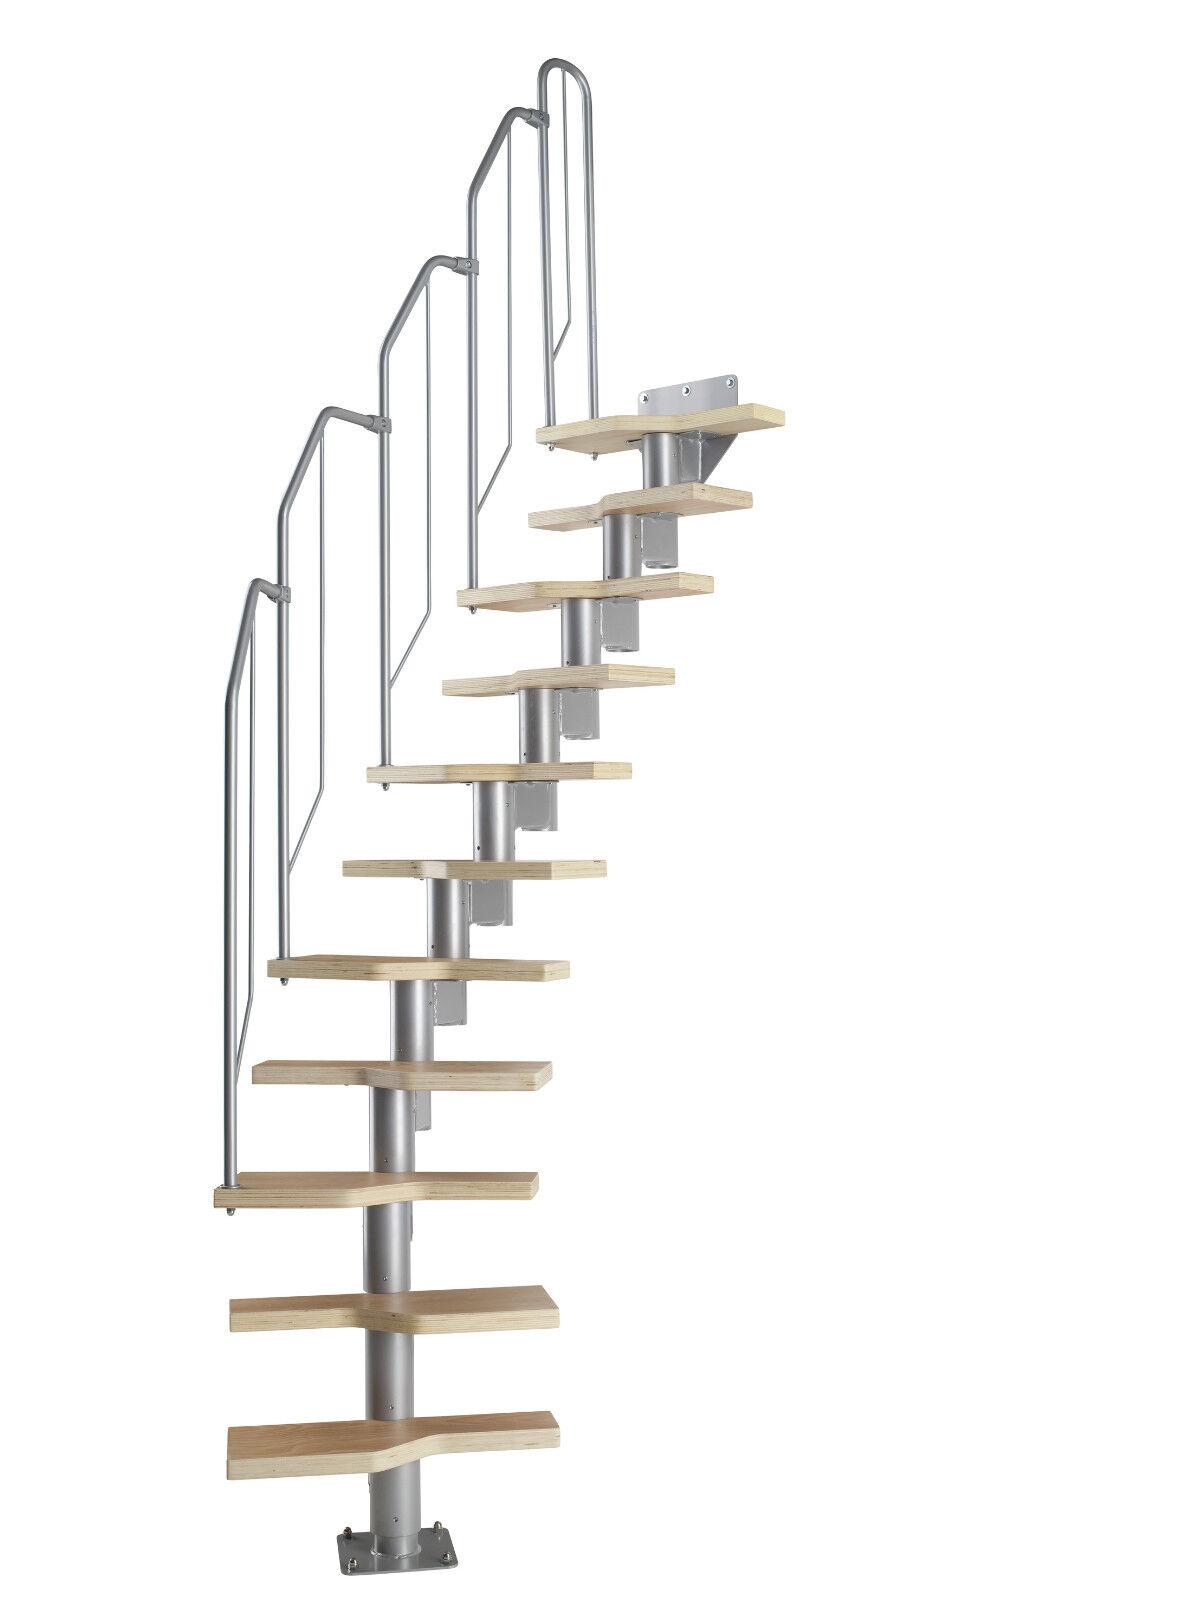 raumspartreppe mit buche holz stufen geschossh he 222 276 cm einfache montage eur 379 49. Black Bedroom Furniture Sets. Home Design Ideas